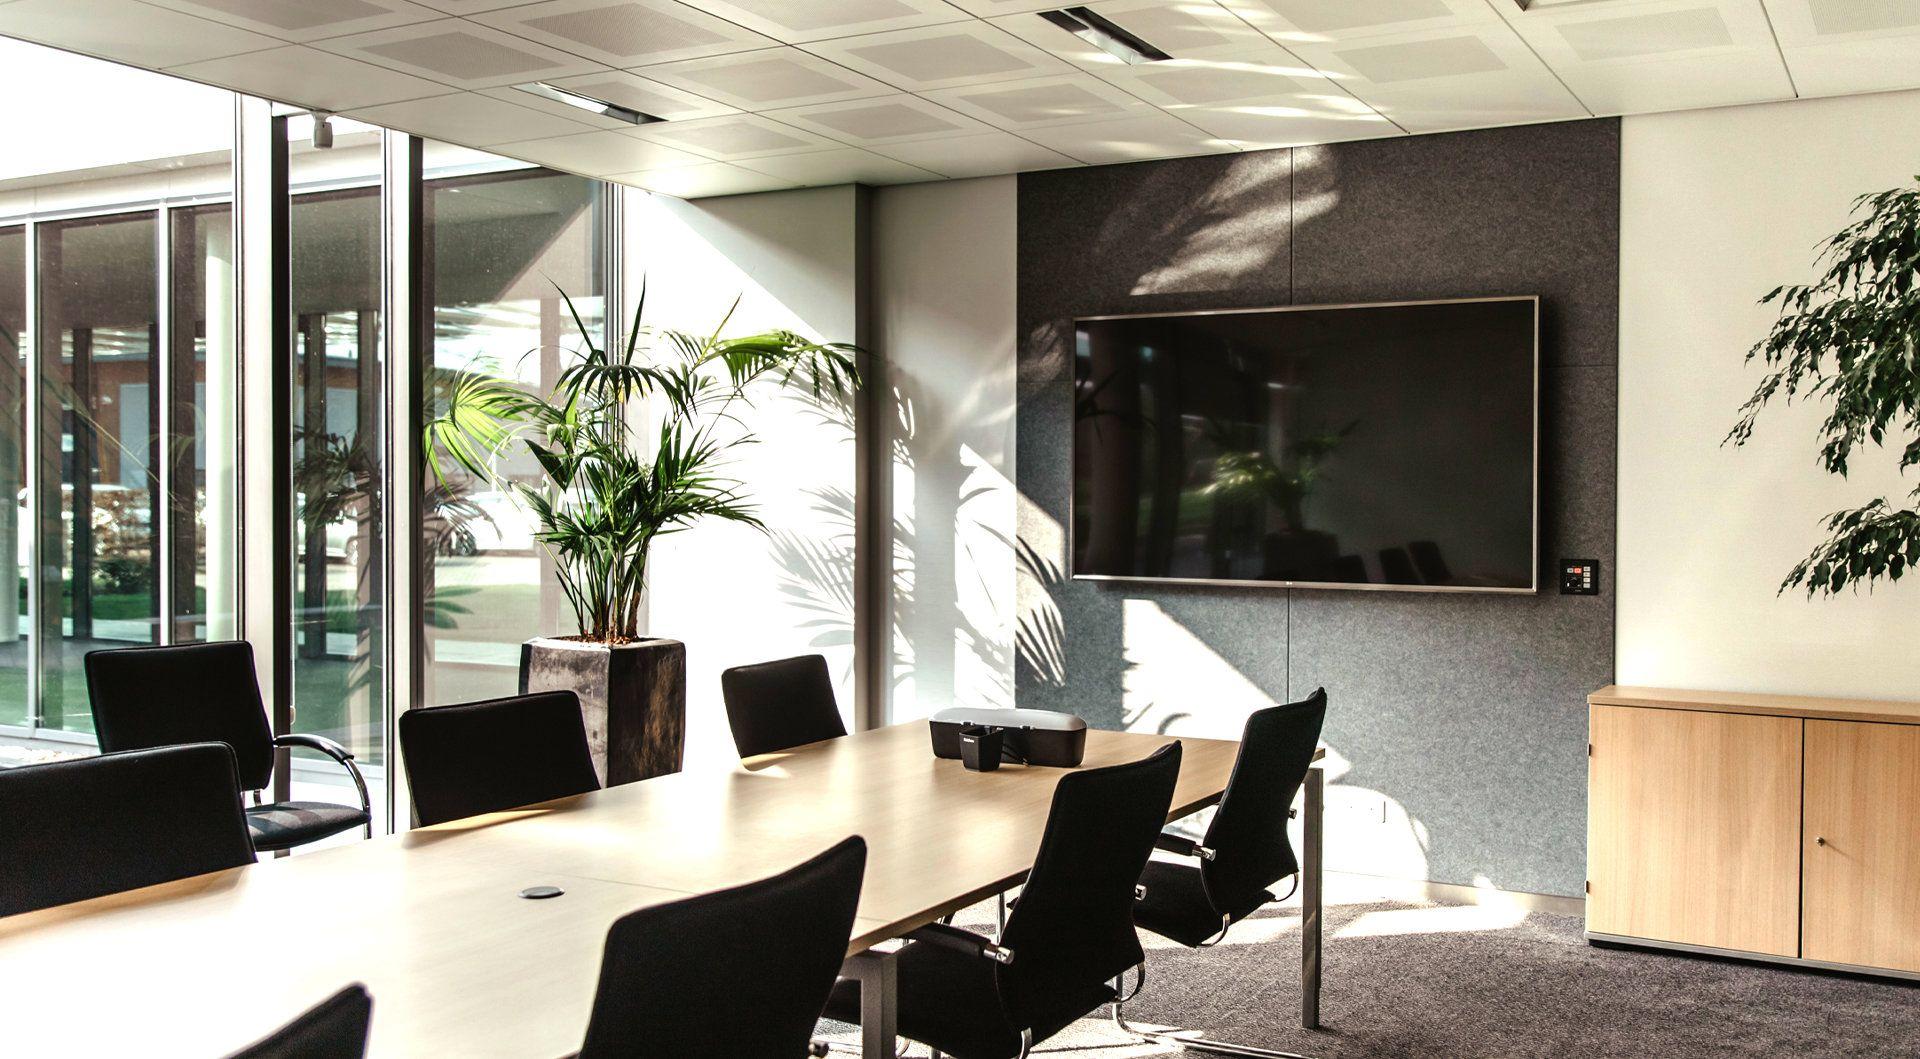 Sony VPL-FHZ75 beamer/projector Desktopprojector 6500 ANSI lumens 3LCD WUXGA (1920x1200) Zwart - Case studie de vries